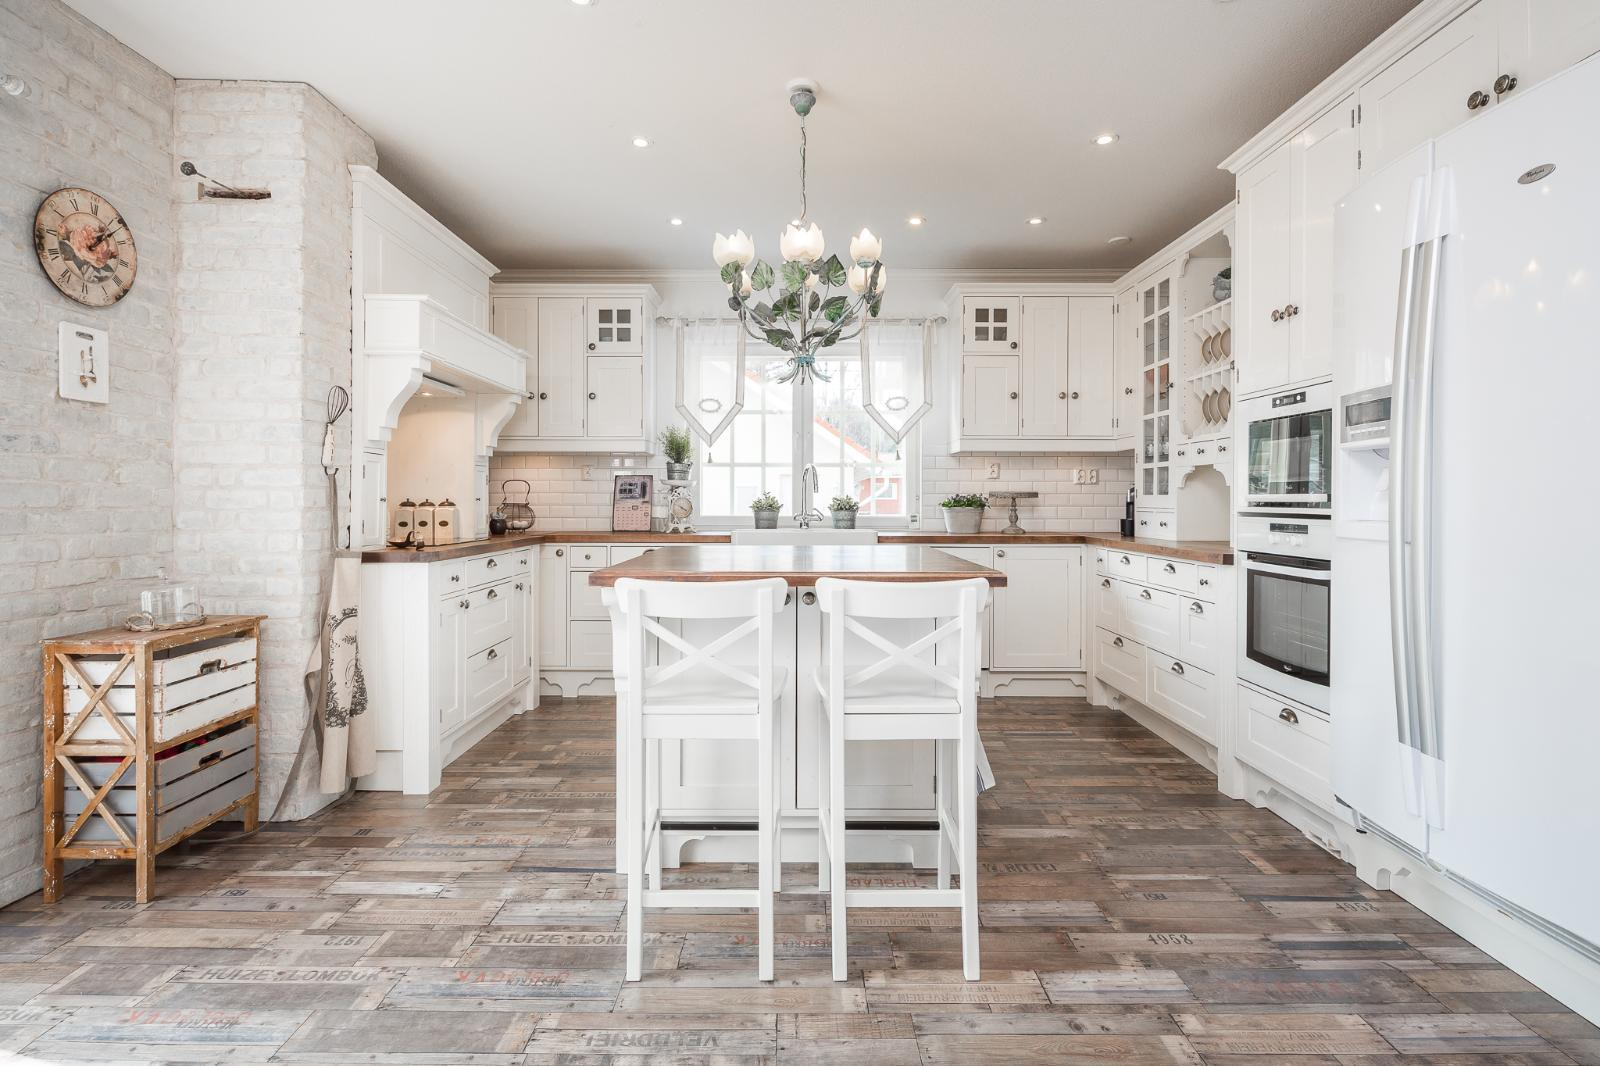 Tilava ja kodikas keittiö  Etuovi com Ideat & vinkit